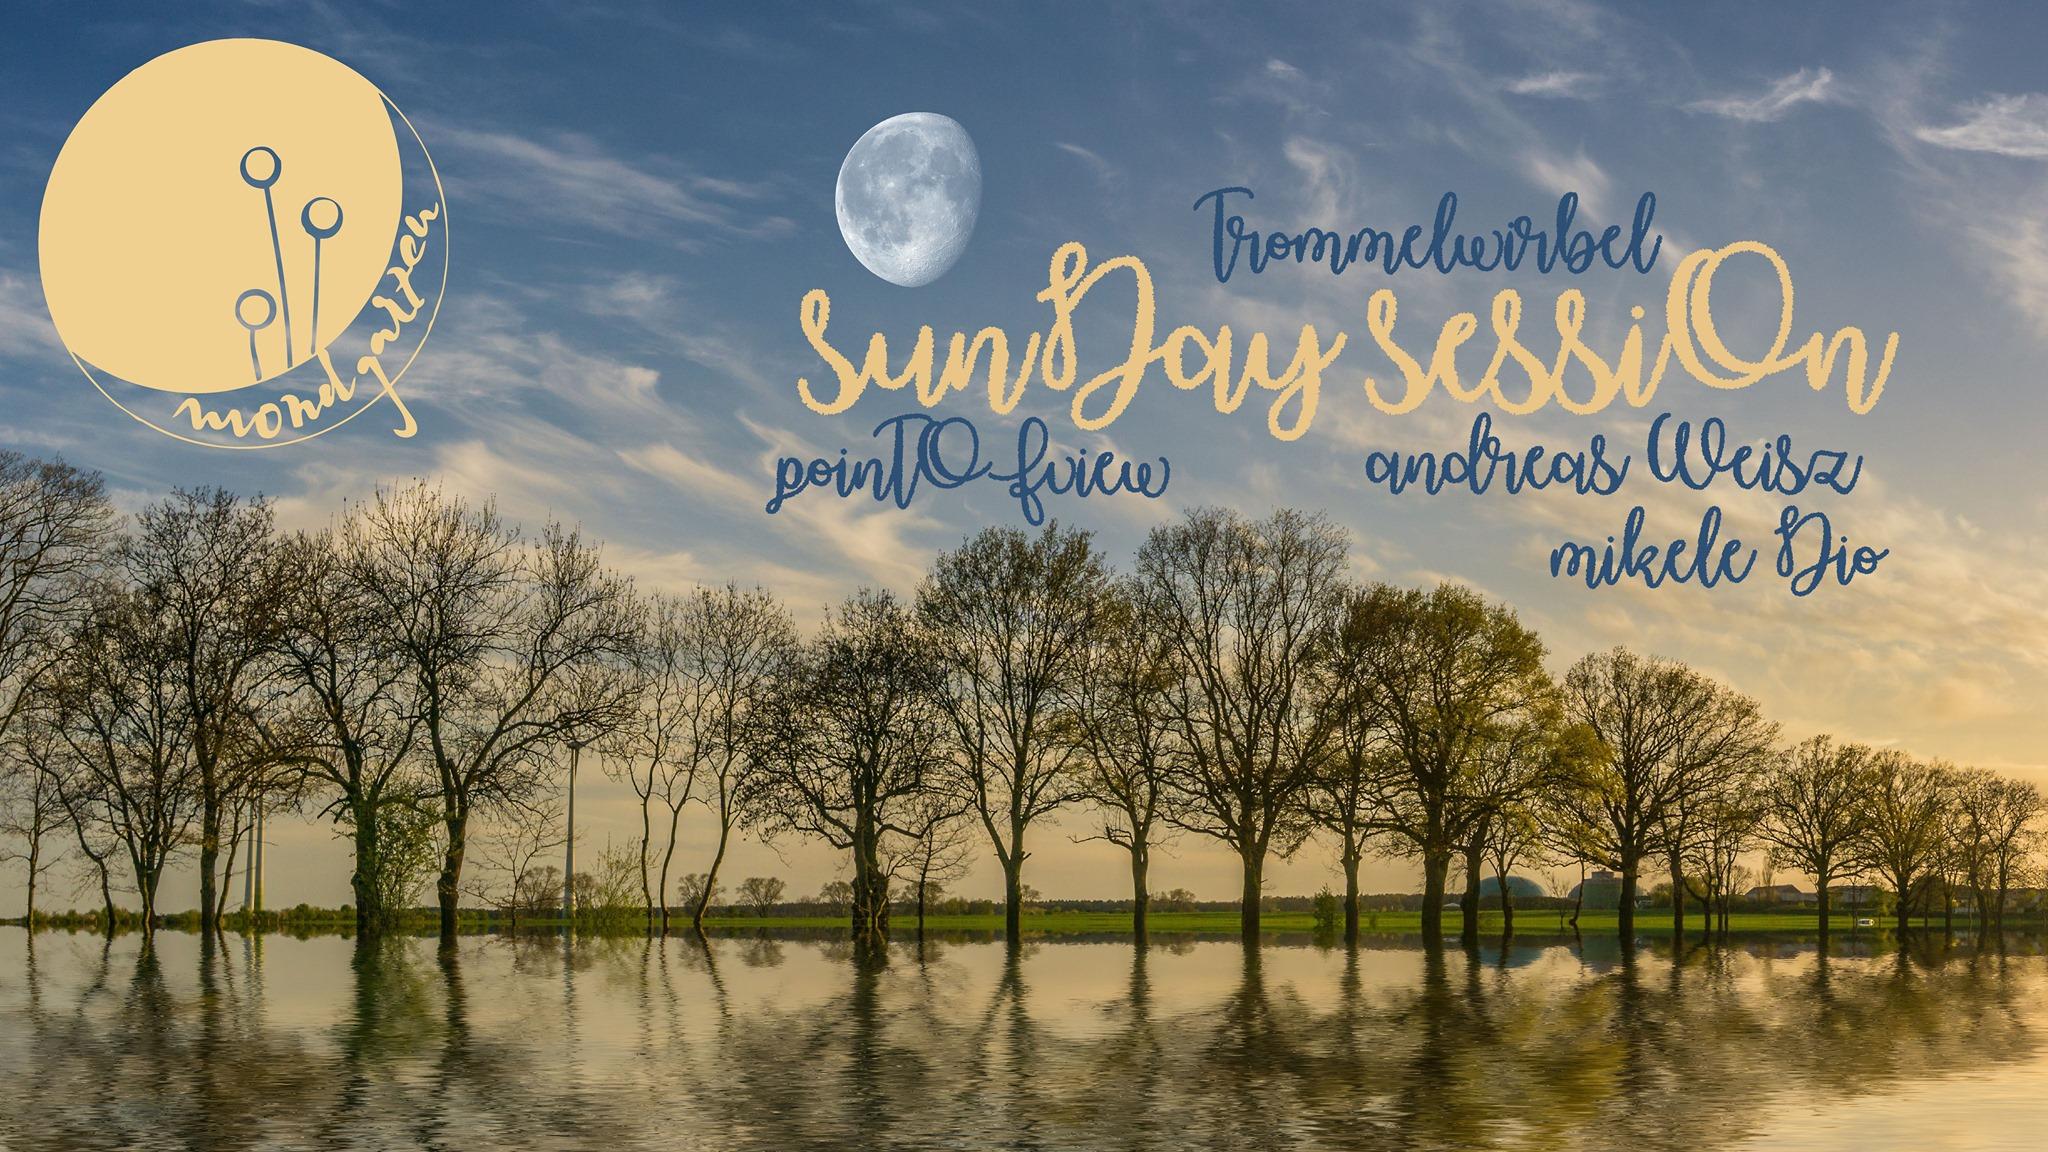 Events Wien: mondGarten sunDay sessiOn